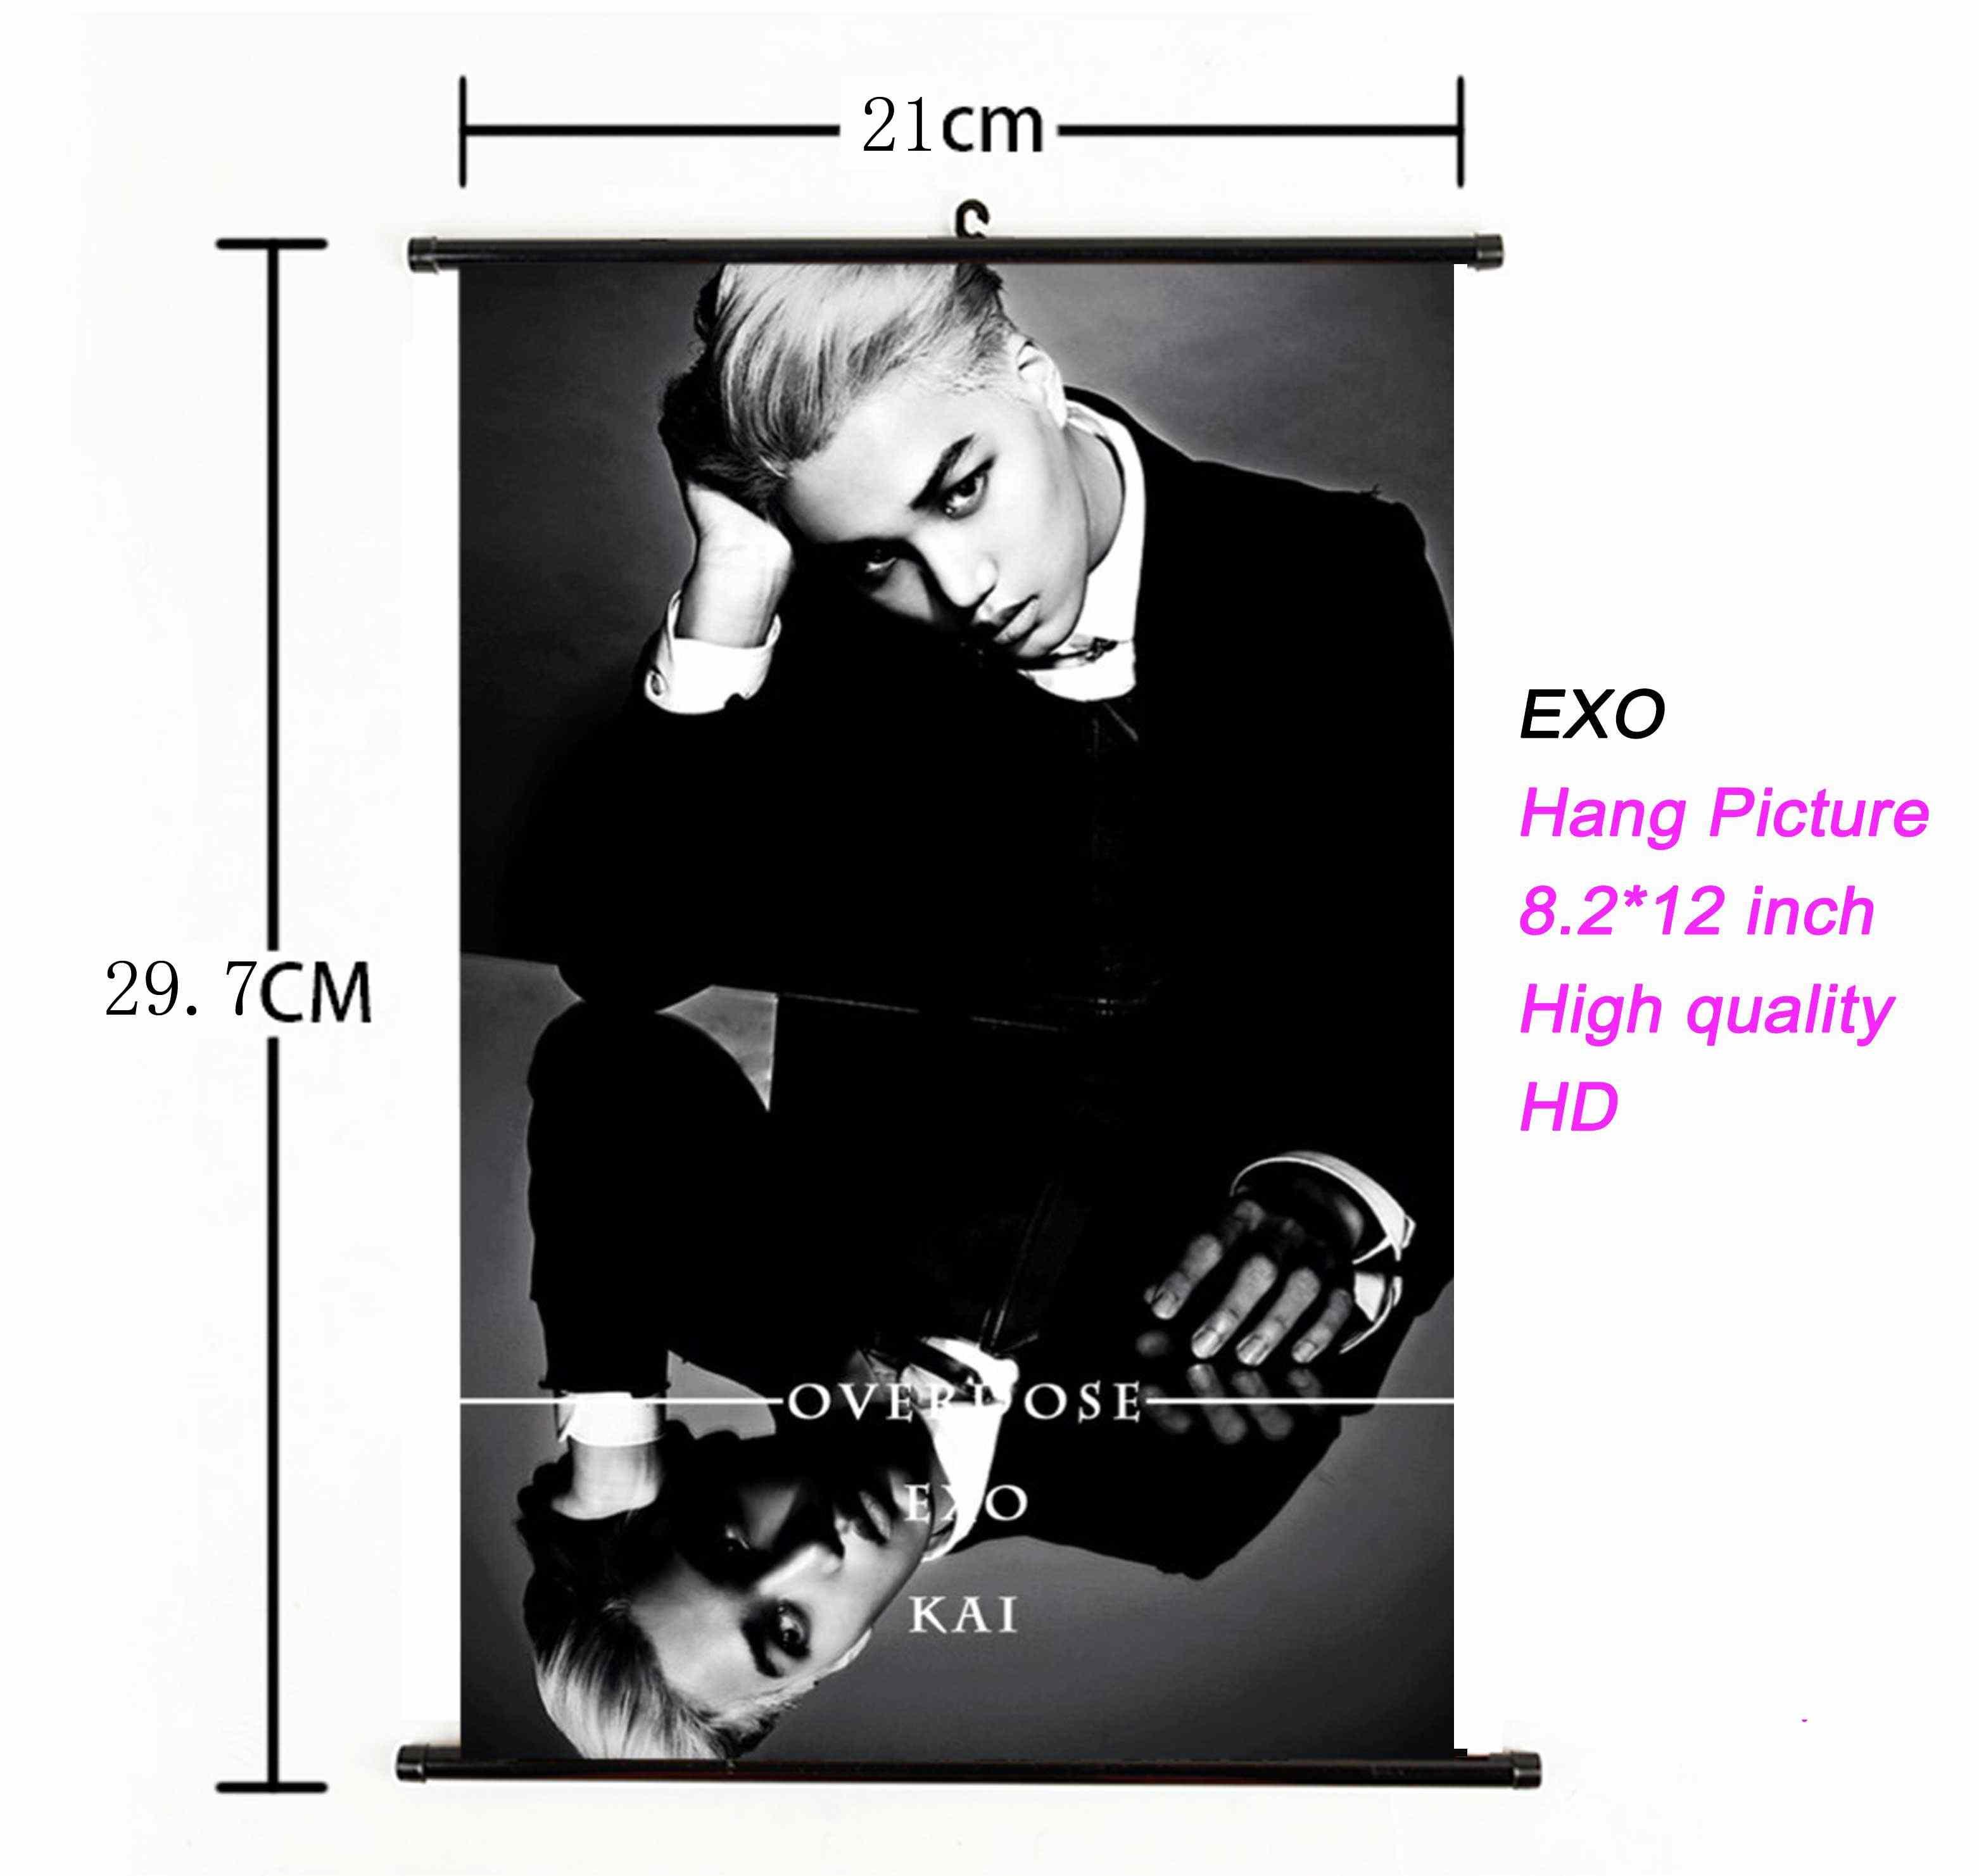 K EXO אלבום לתלות תמונה תמונה פוסטר Kpop EXO לתלות פוסטר בד 21*30cm באיכות גבוהה עבור אוהדי מתנת אוסף